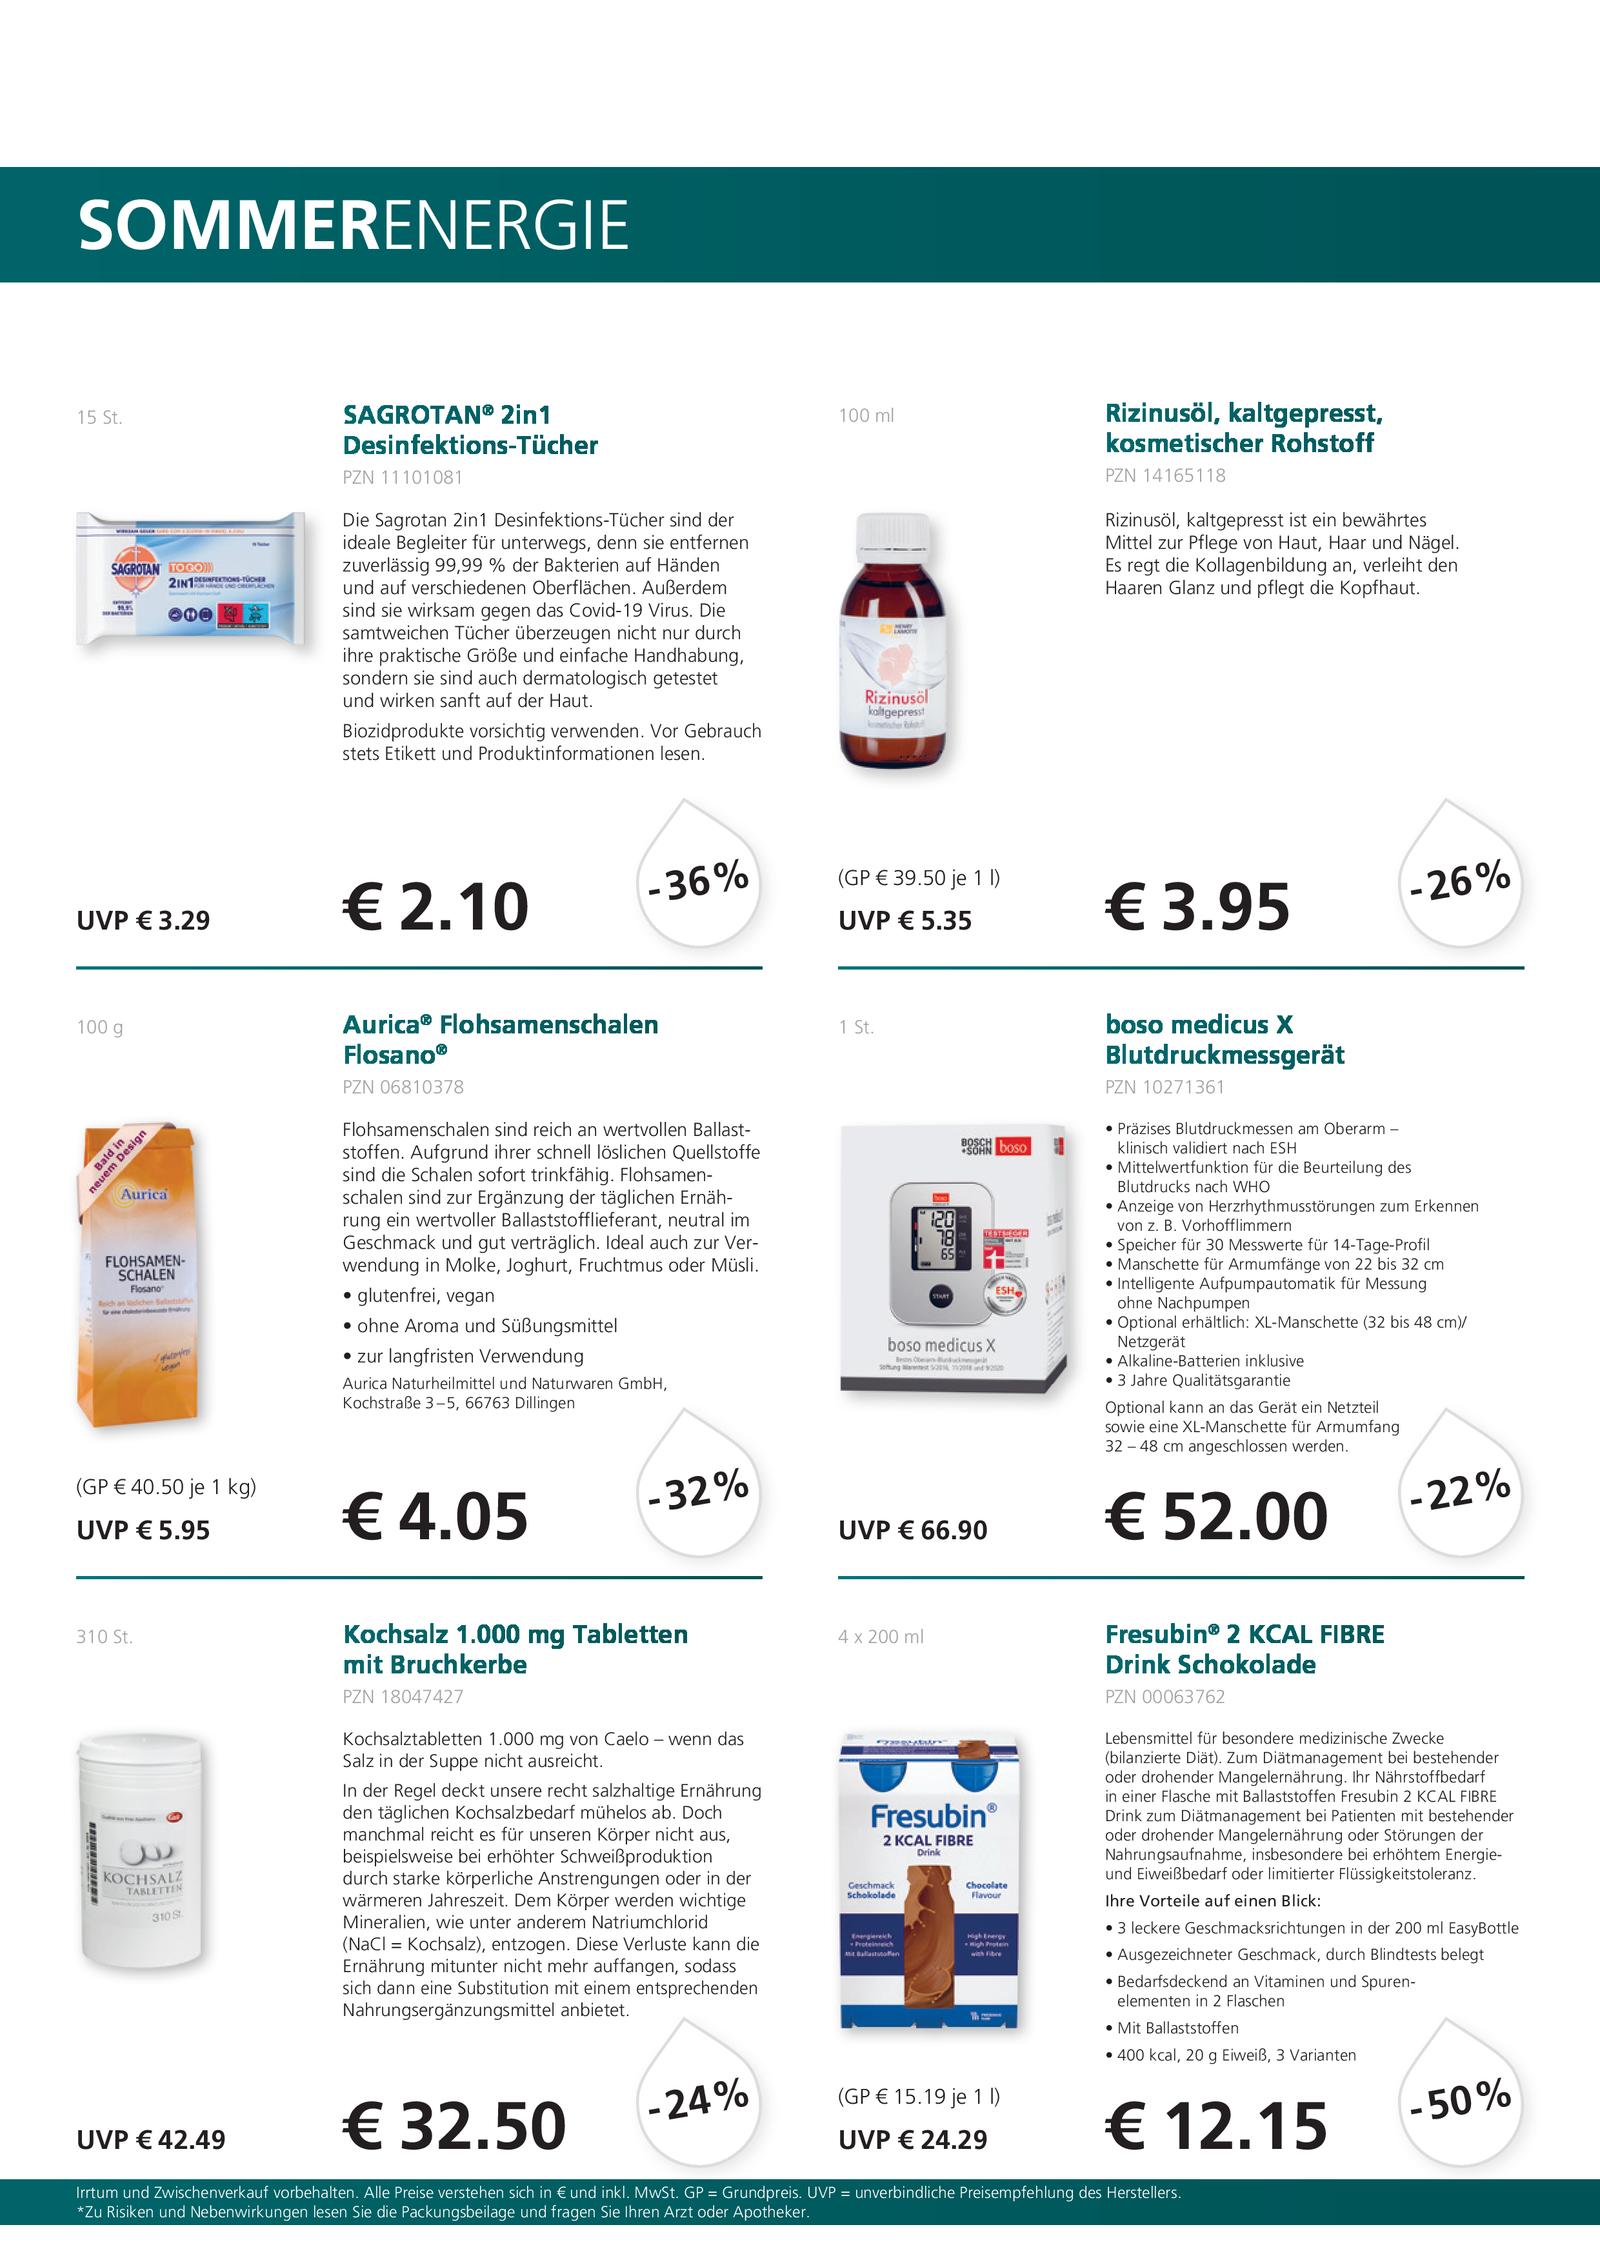 https://mein-uploads.apocdn.net/9109/leaflets/9109_flyer-Seite3.png